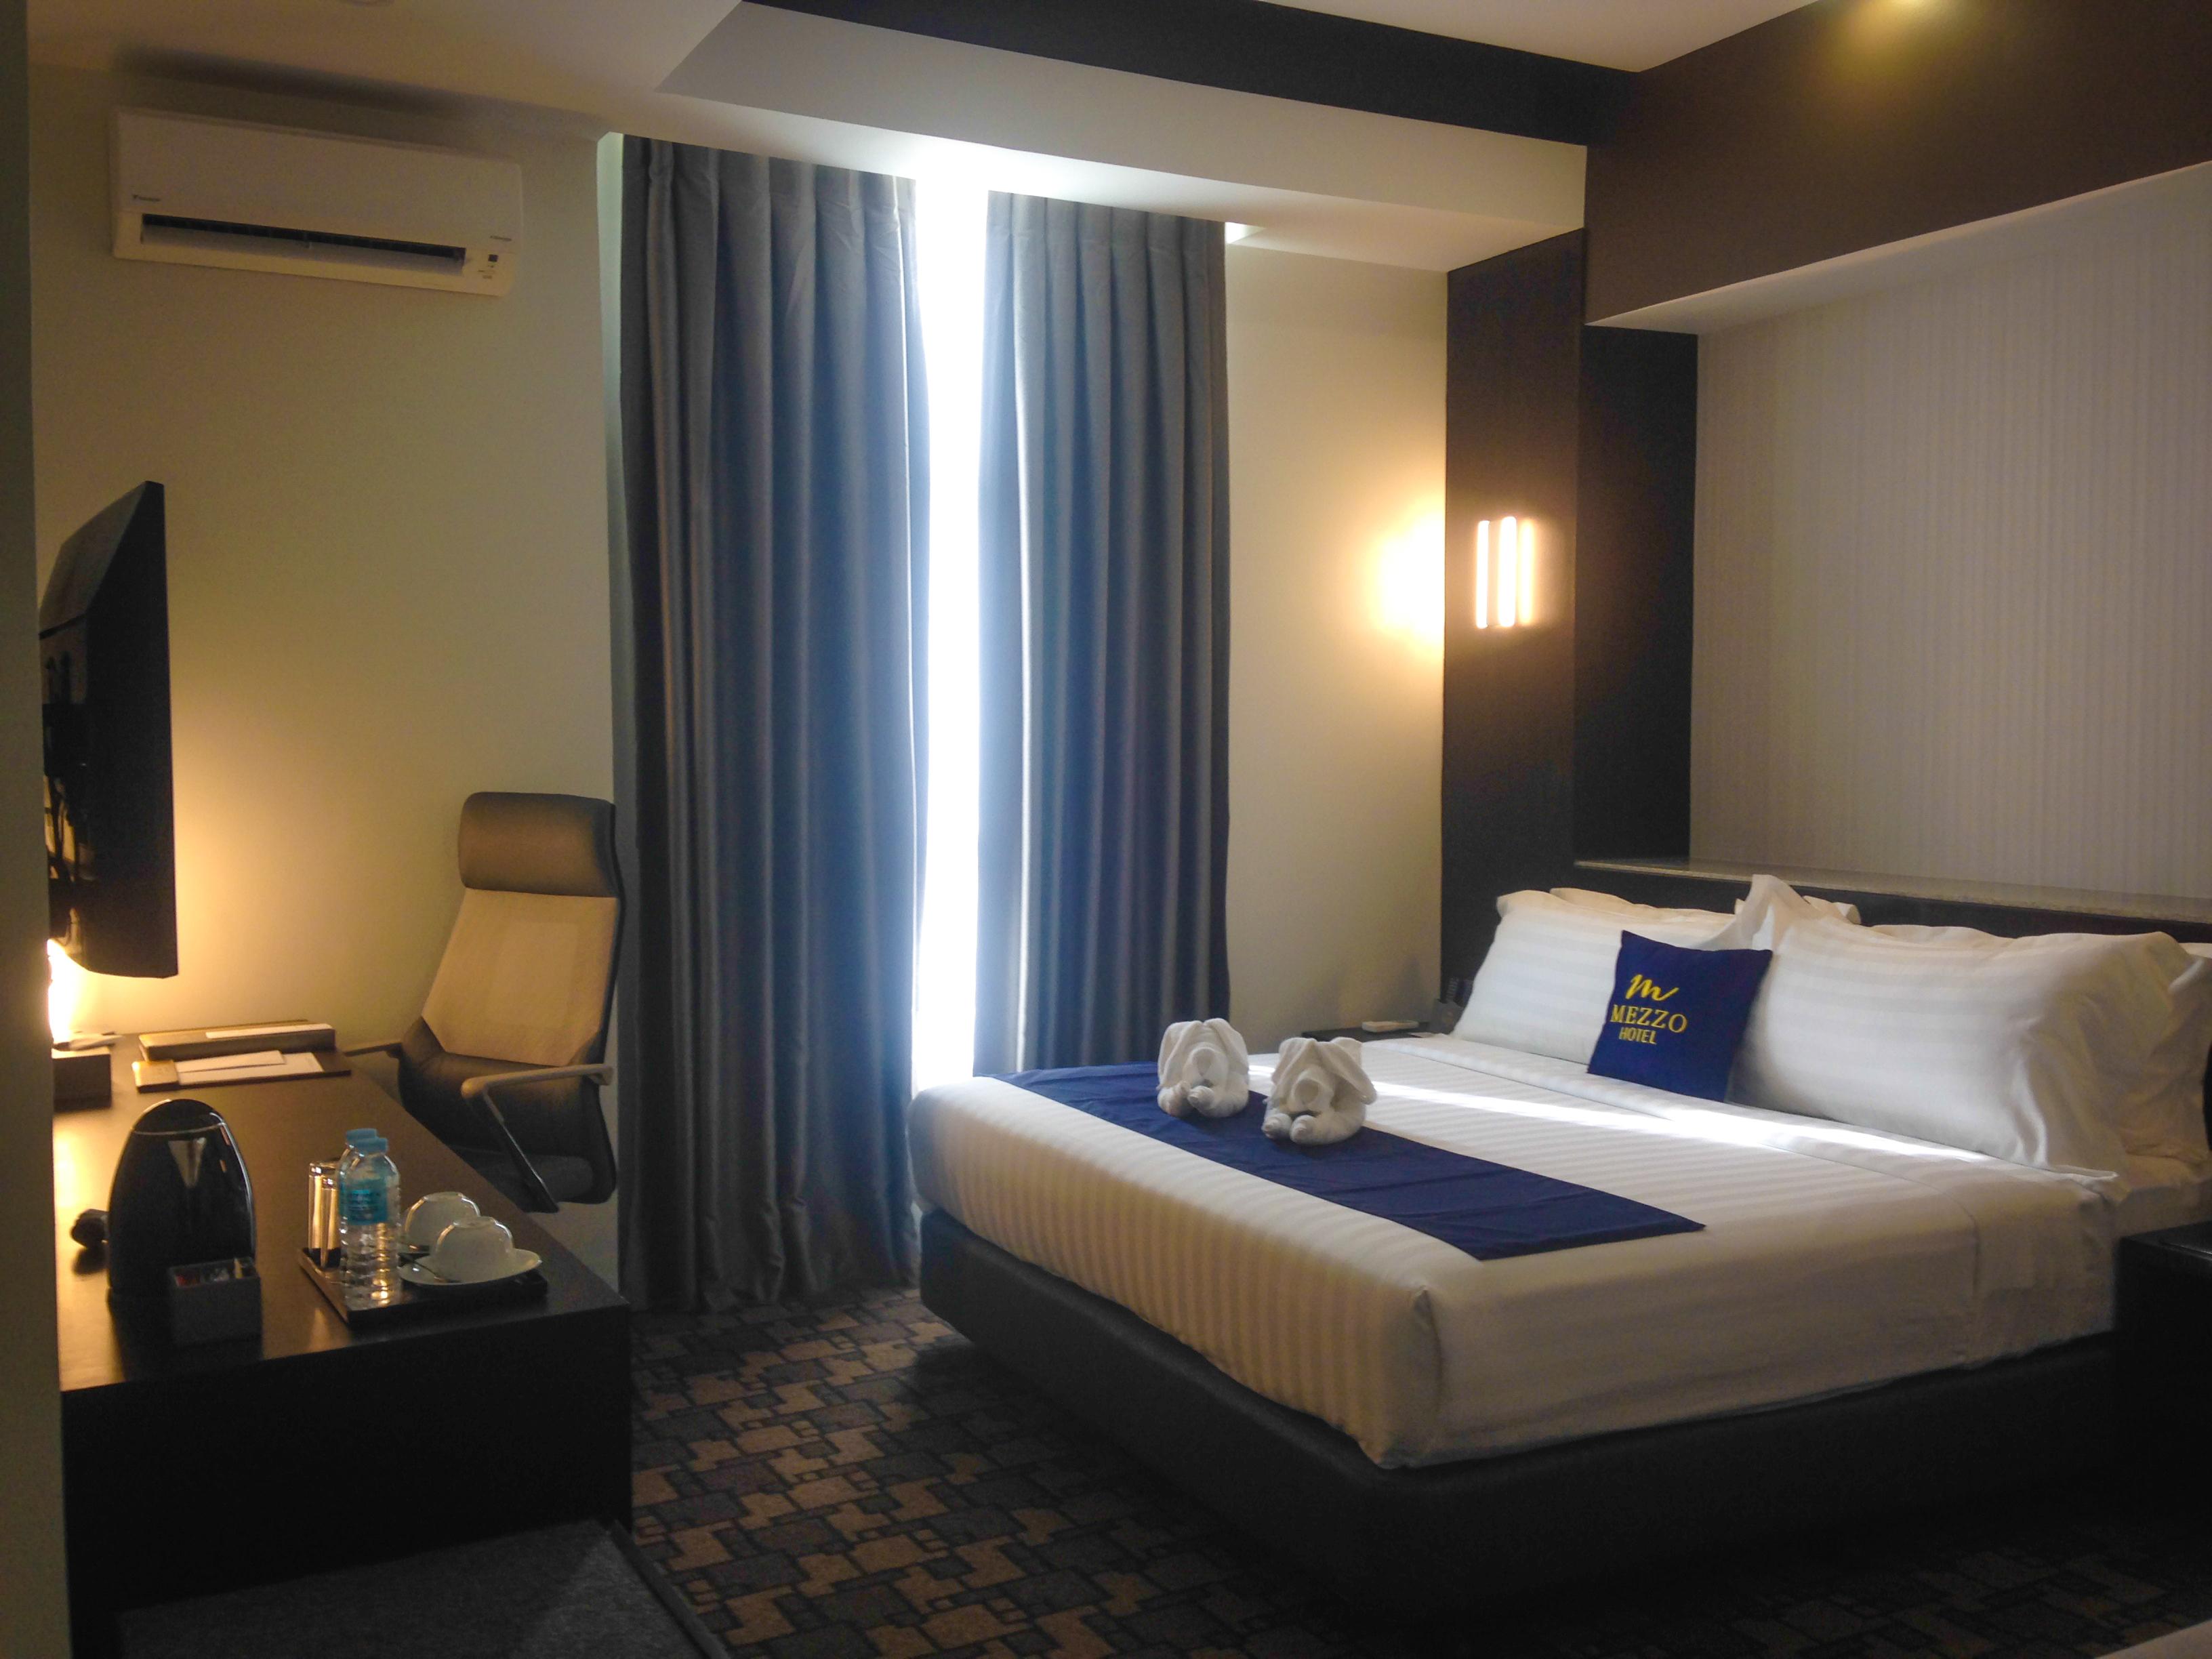 Mezzo Hotel Cebu